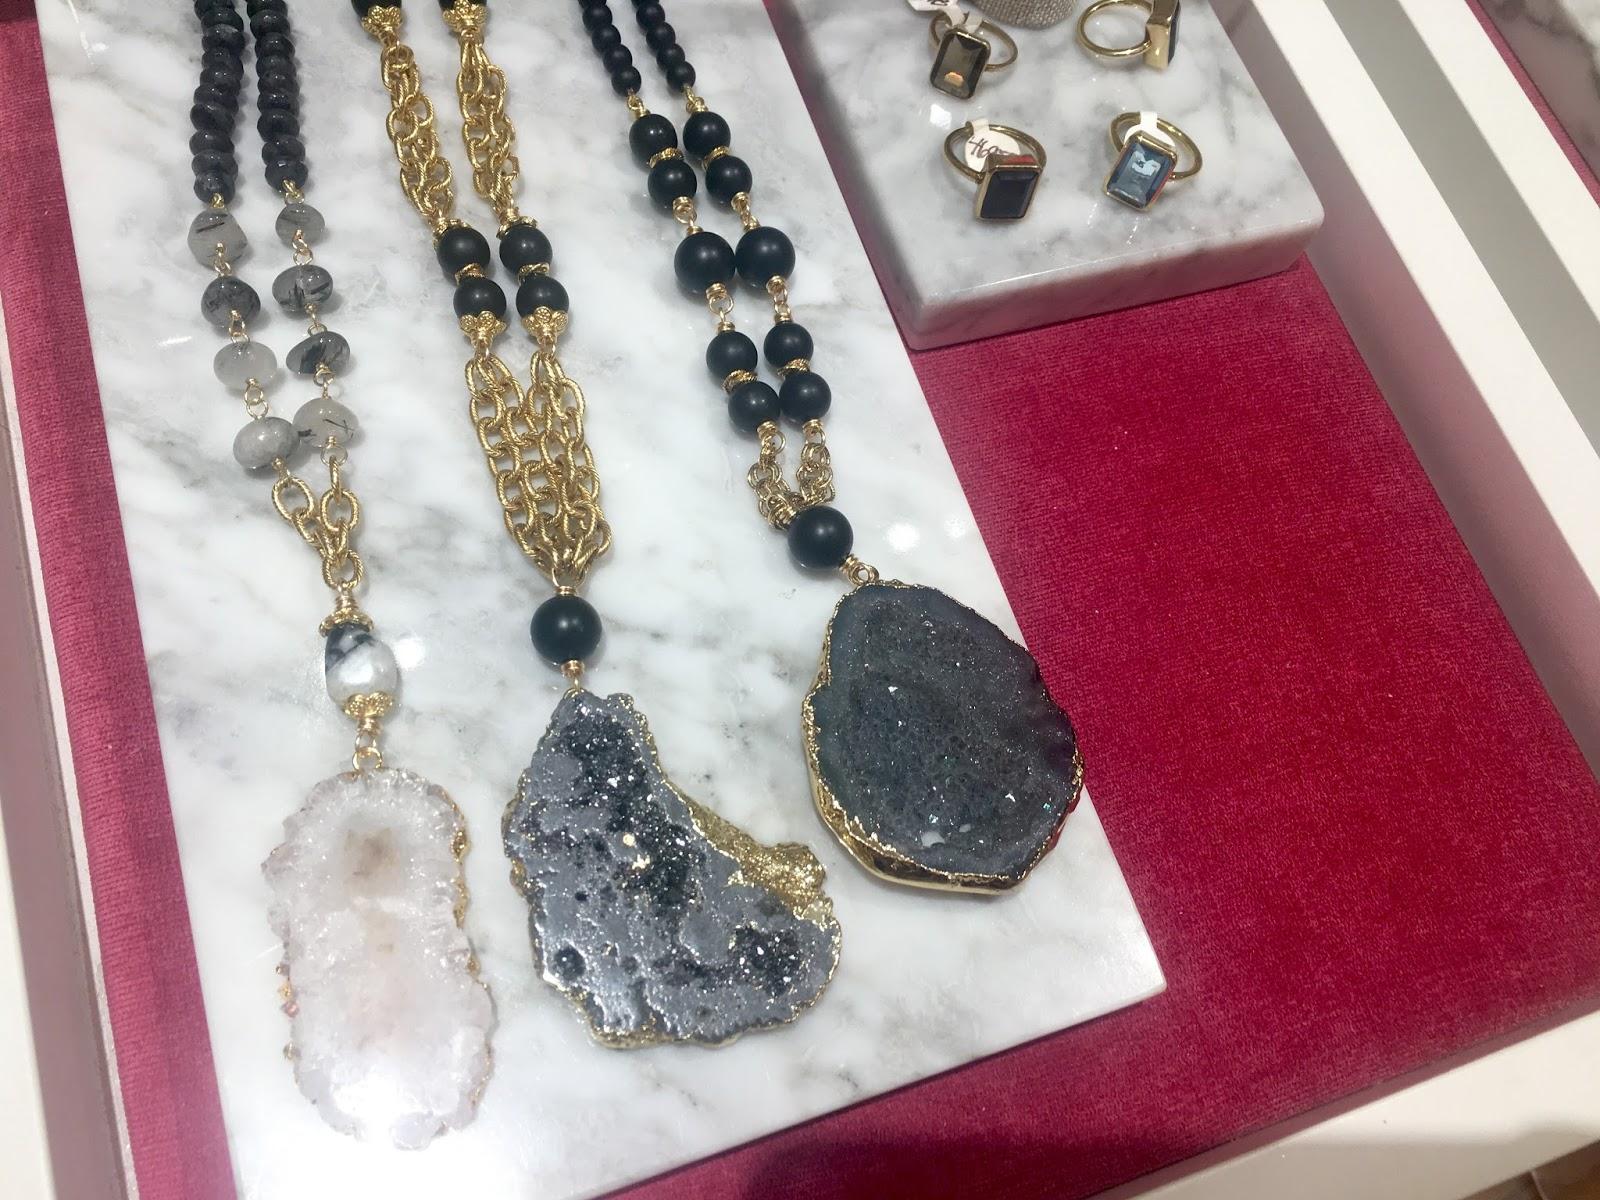 Stone beaded necklaces